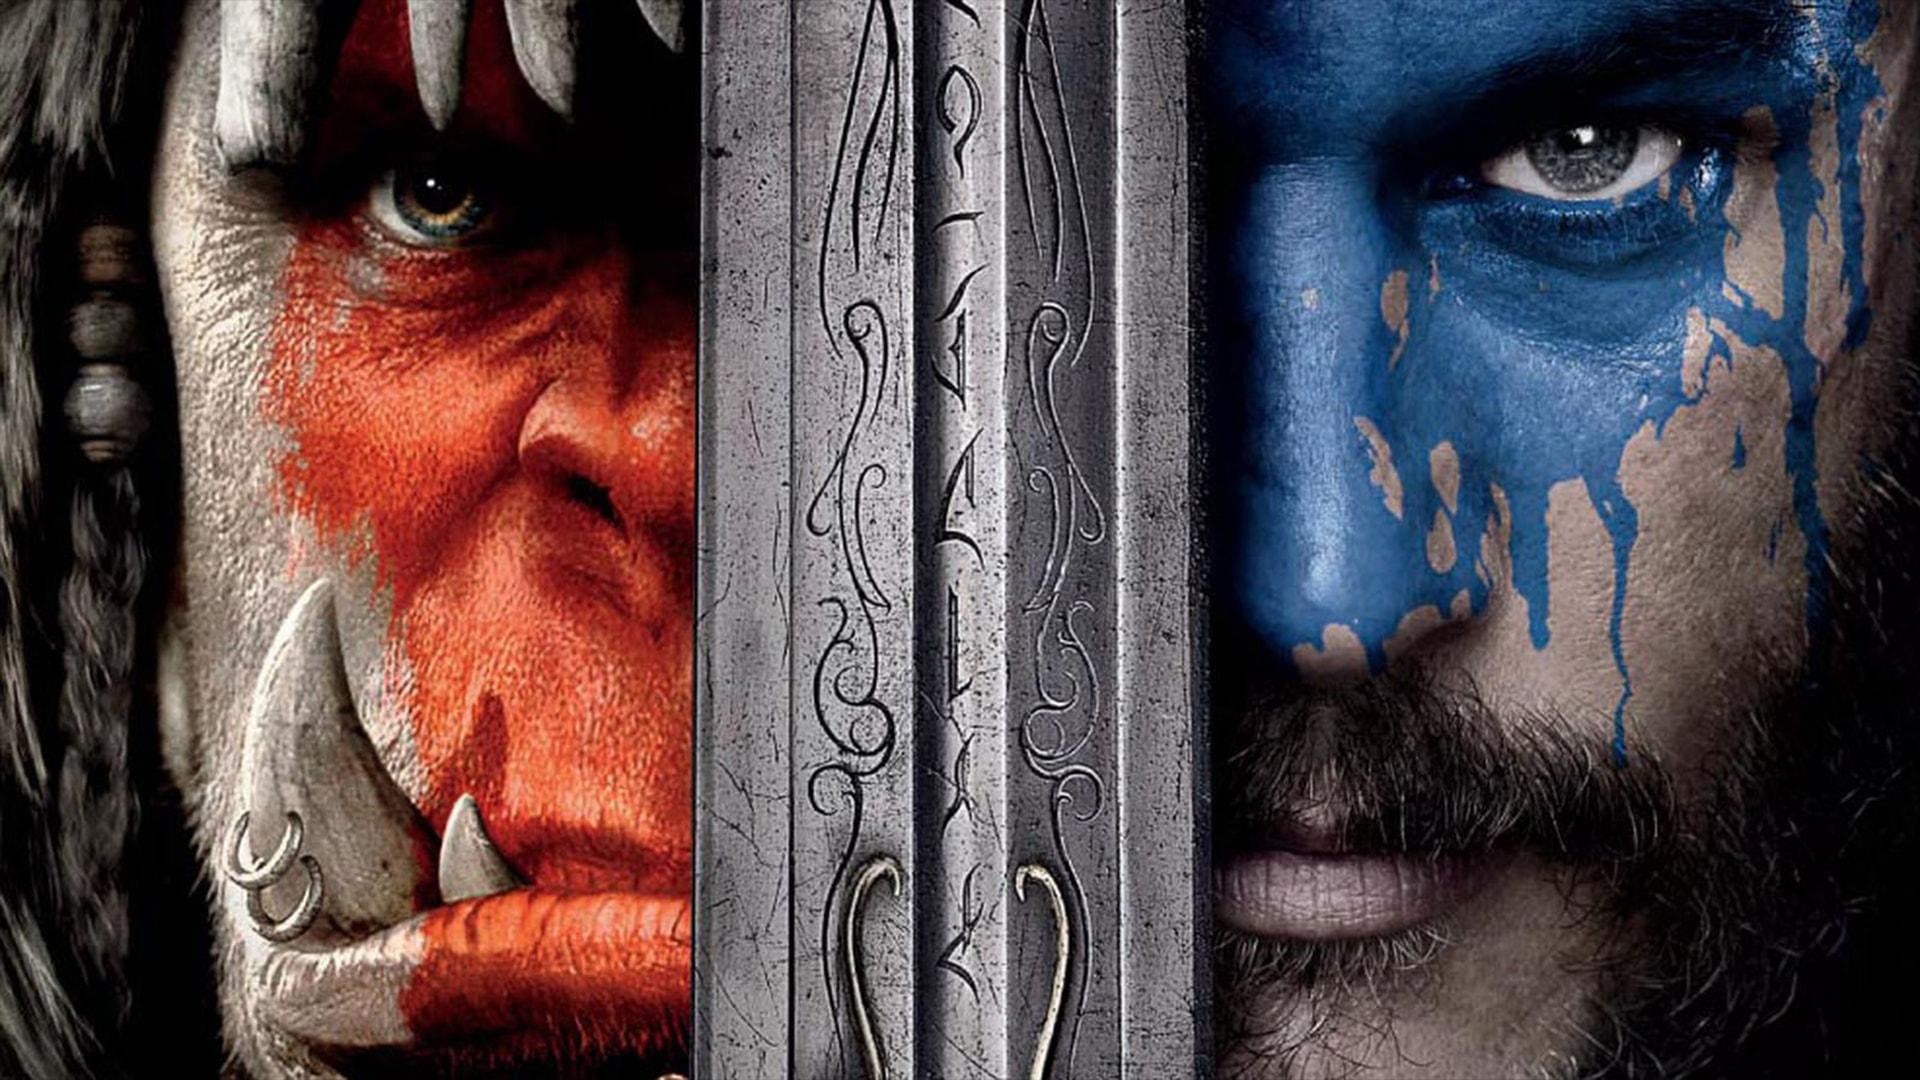 Warcraft widescreen wallpapers